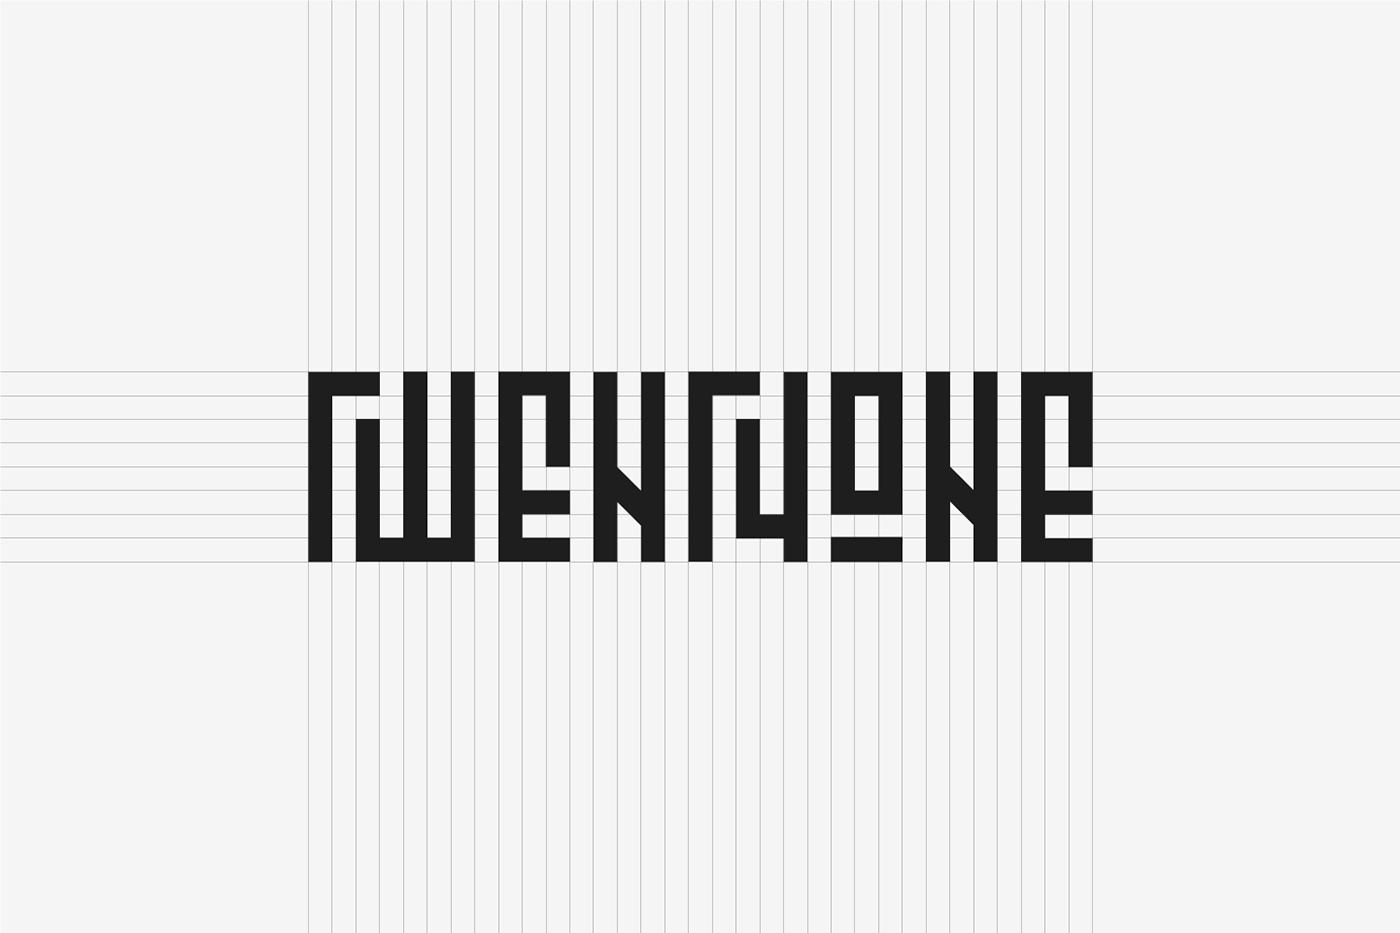 escape free Typeface font geometric grid Headline simple minimal